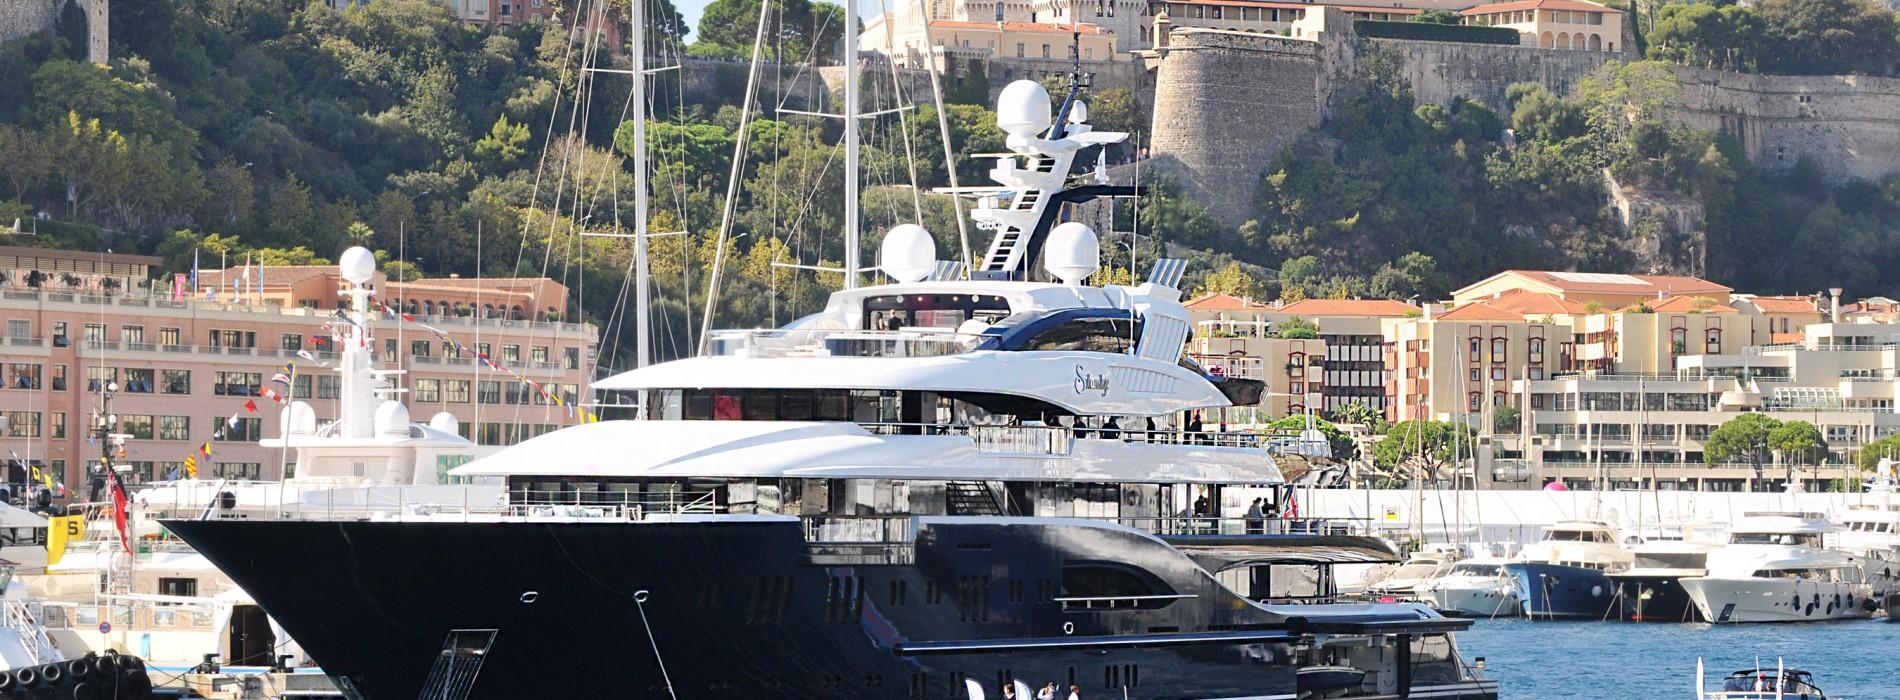 Monaco Yacht Show 23 – 26 September 2015